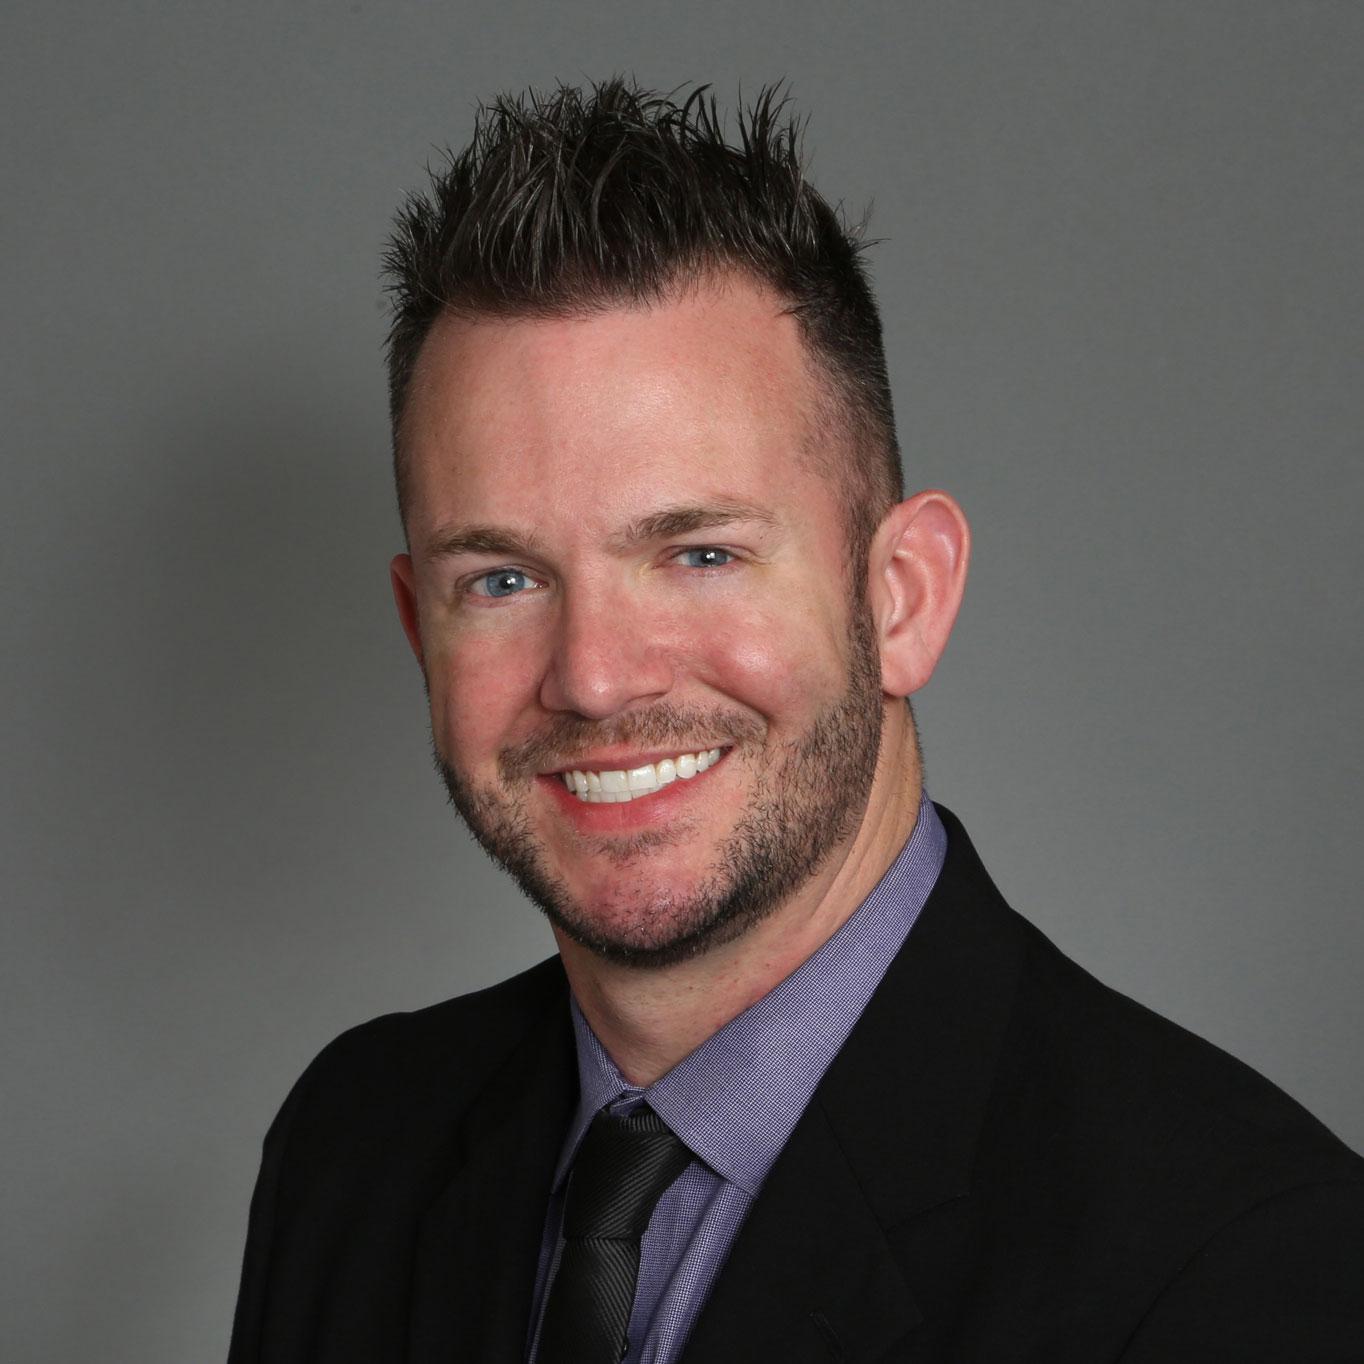 Francisco-Cody-senior-advisor-language-access-solutions-large